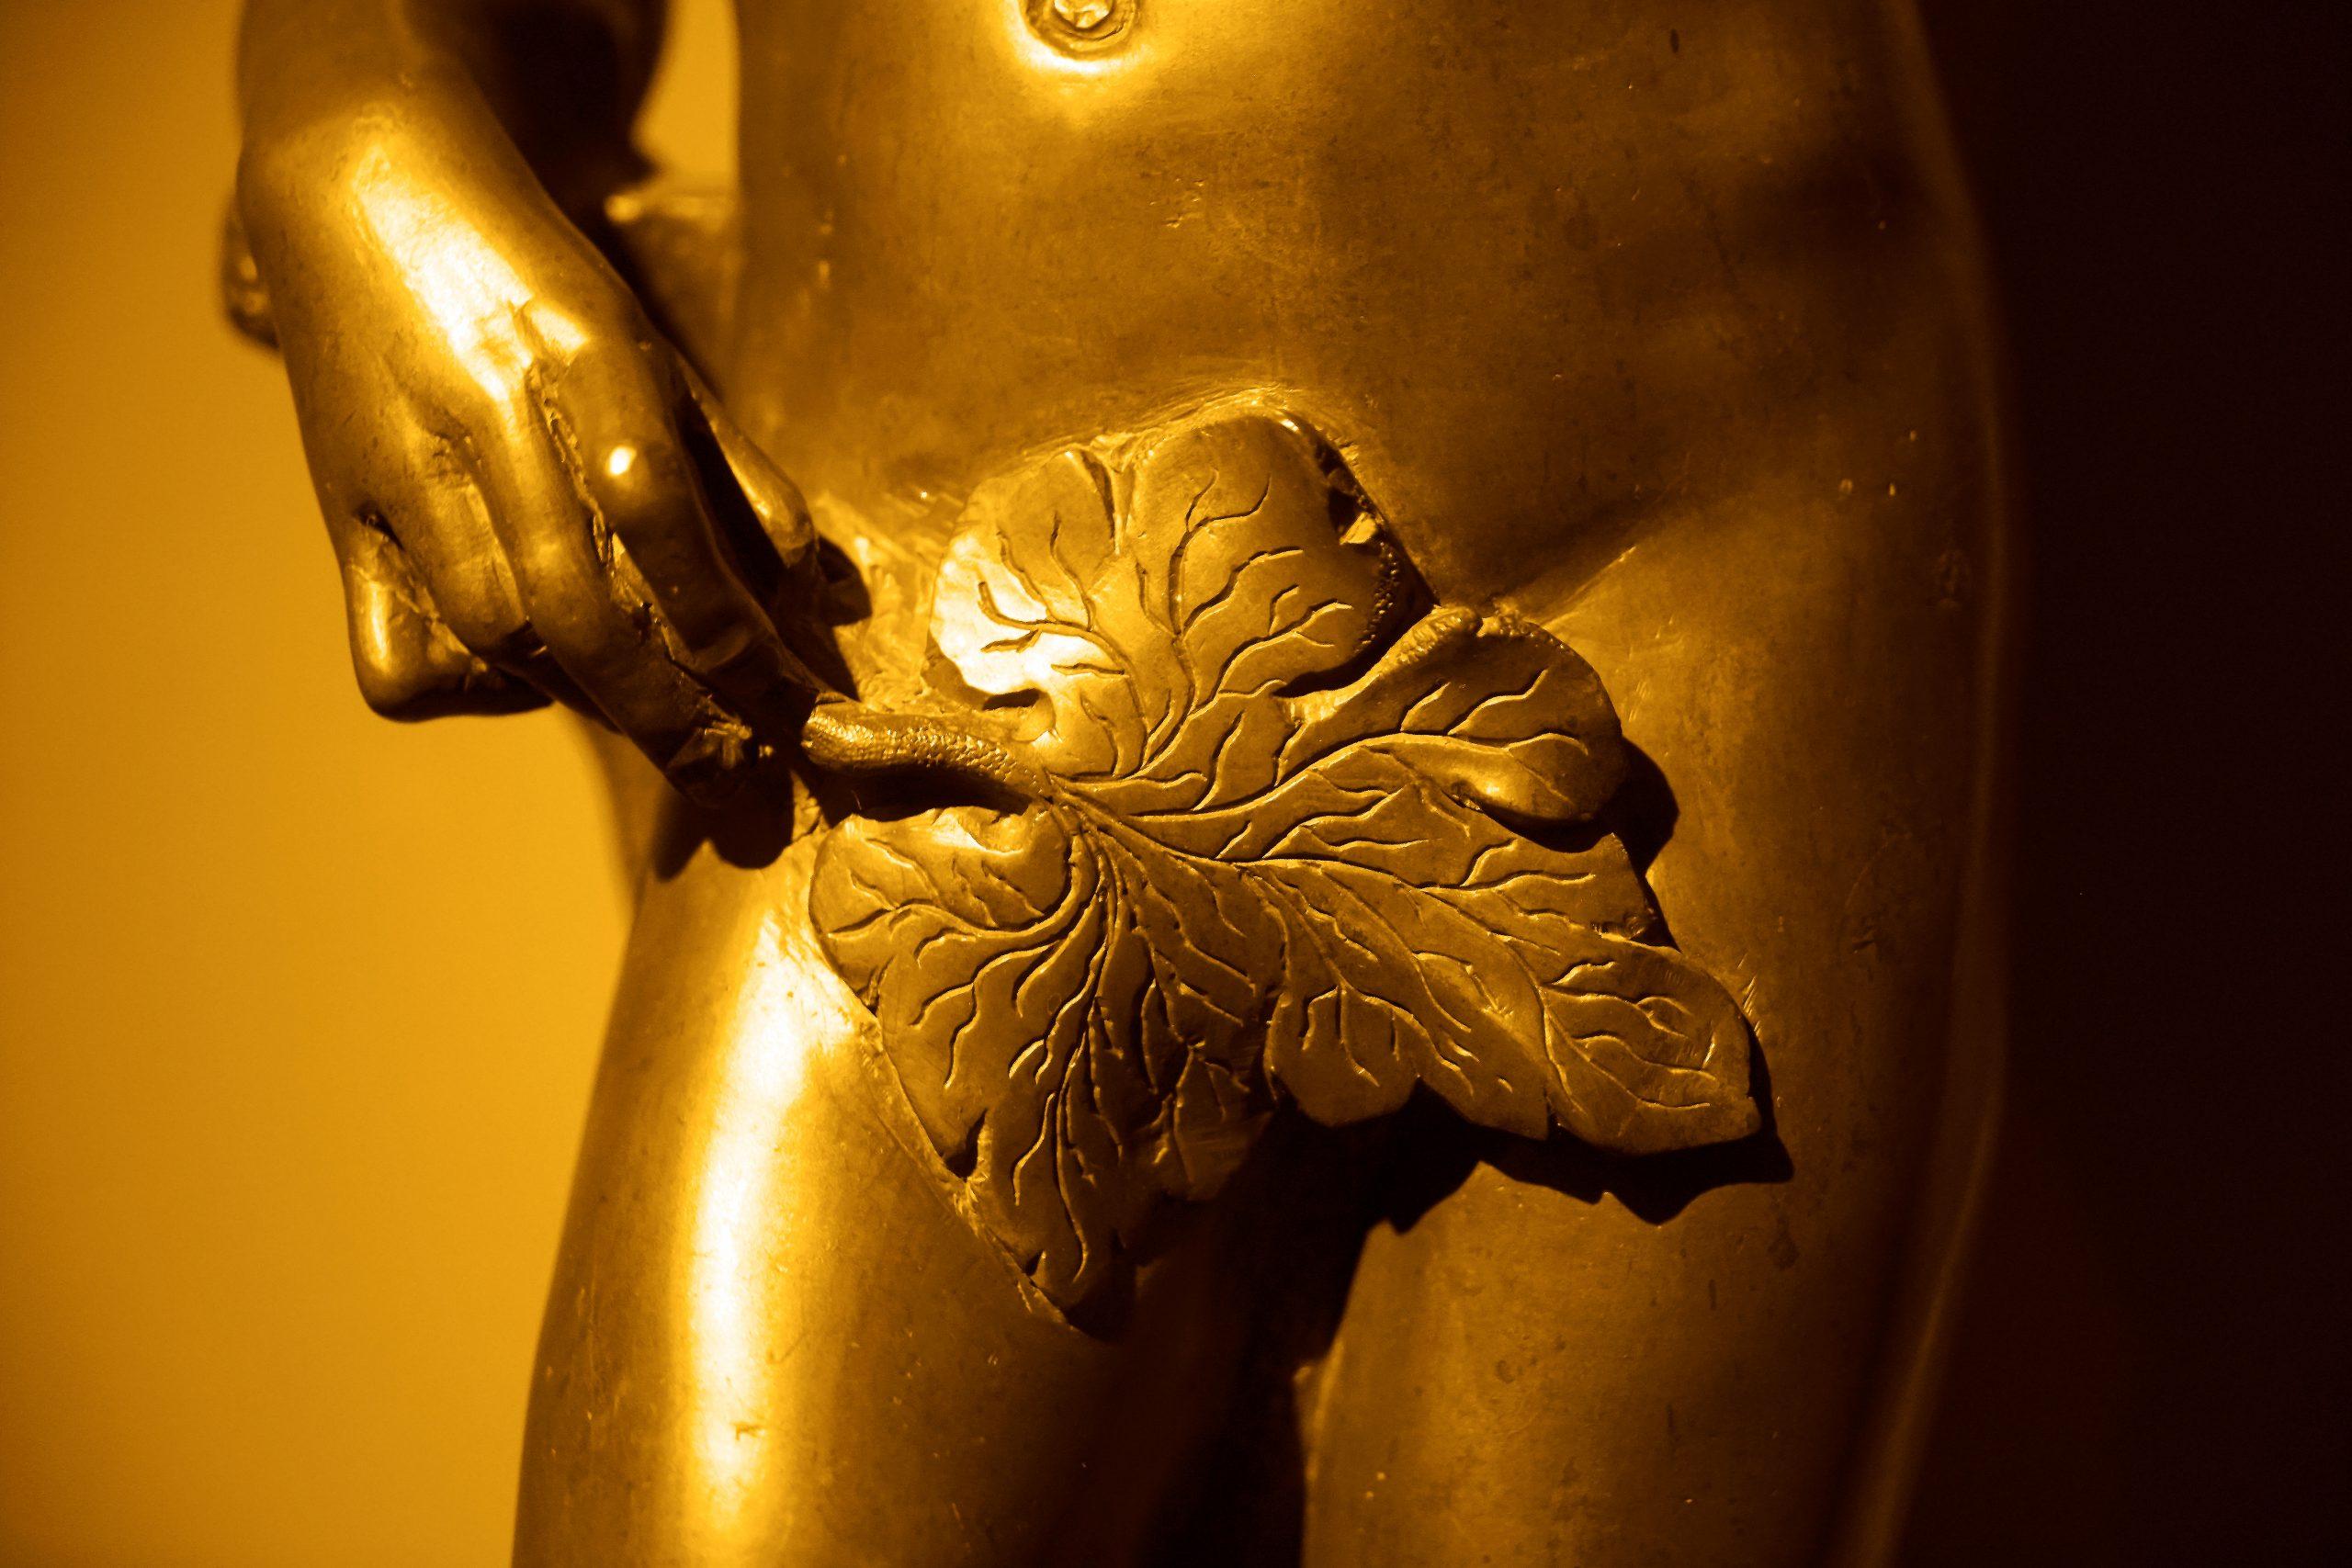 Sculpture with fig leaf